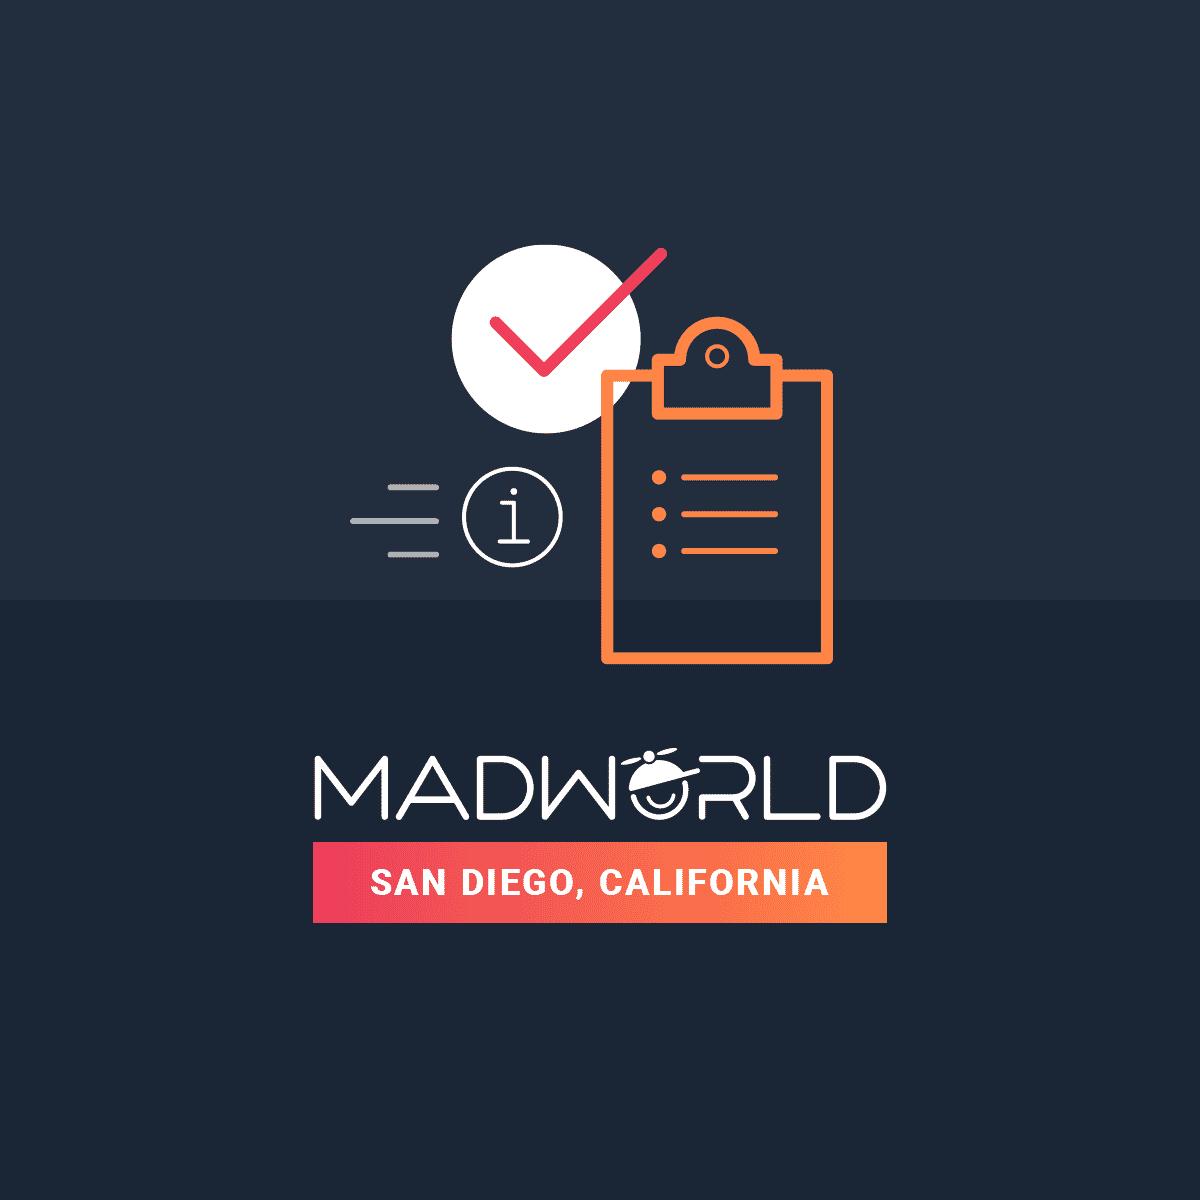 MadWorld 2019 San Diego takes place on April 14-17, 2019.